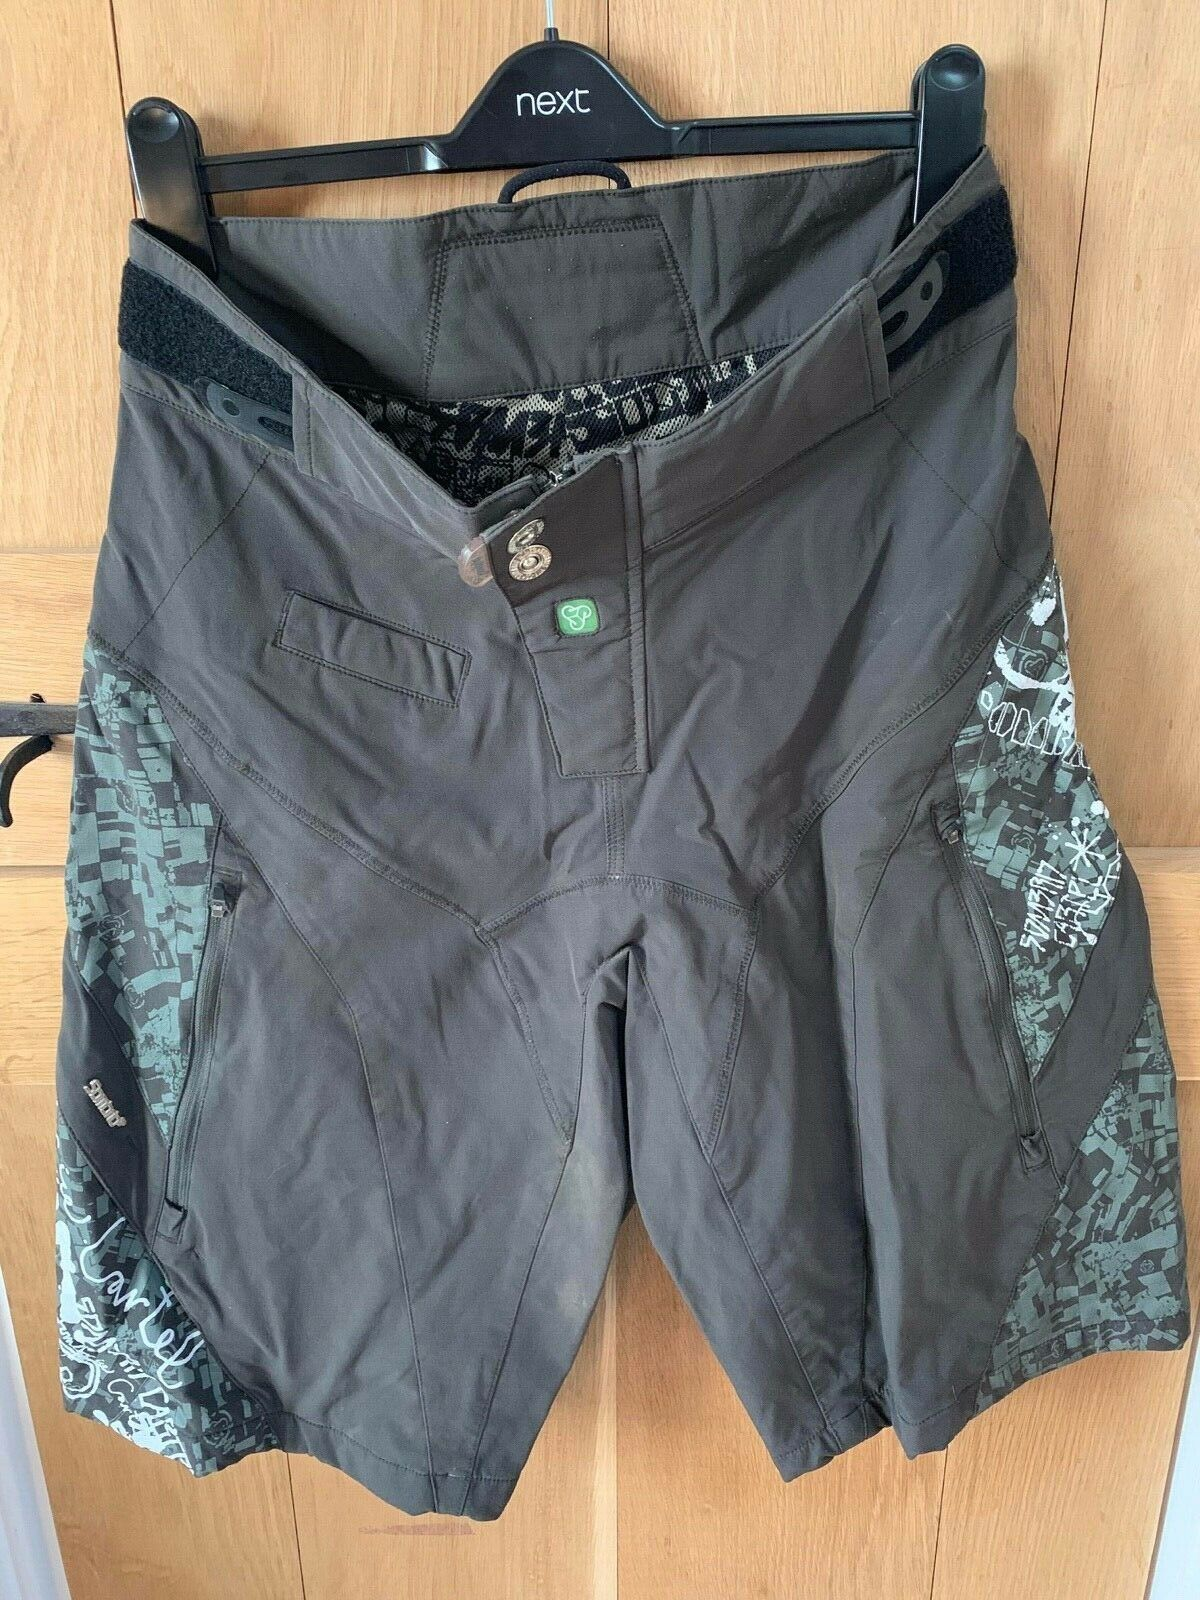 Sombrio Rev Moto  MTB Shorts - M - Olive  high-quality merchandise and convenient, honest service